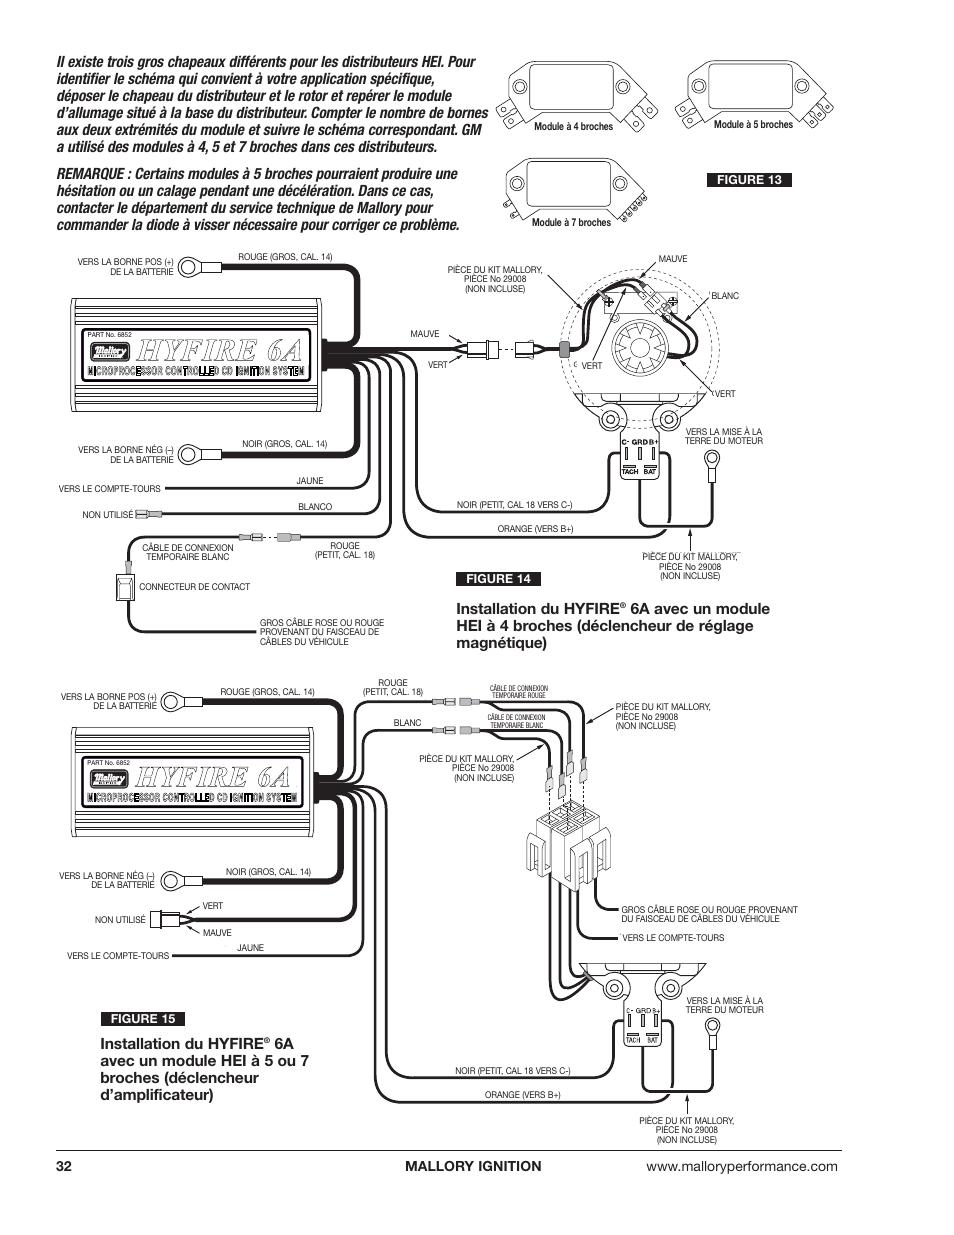 hight resolution of hhy yf fiir re e 6 6a a installation du hyfire mallory ignition mallory